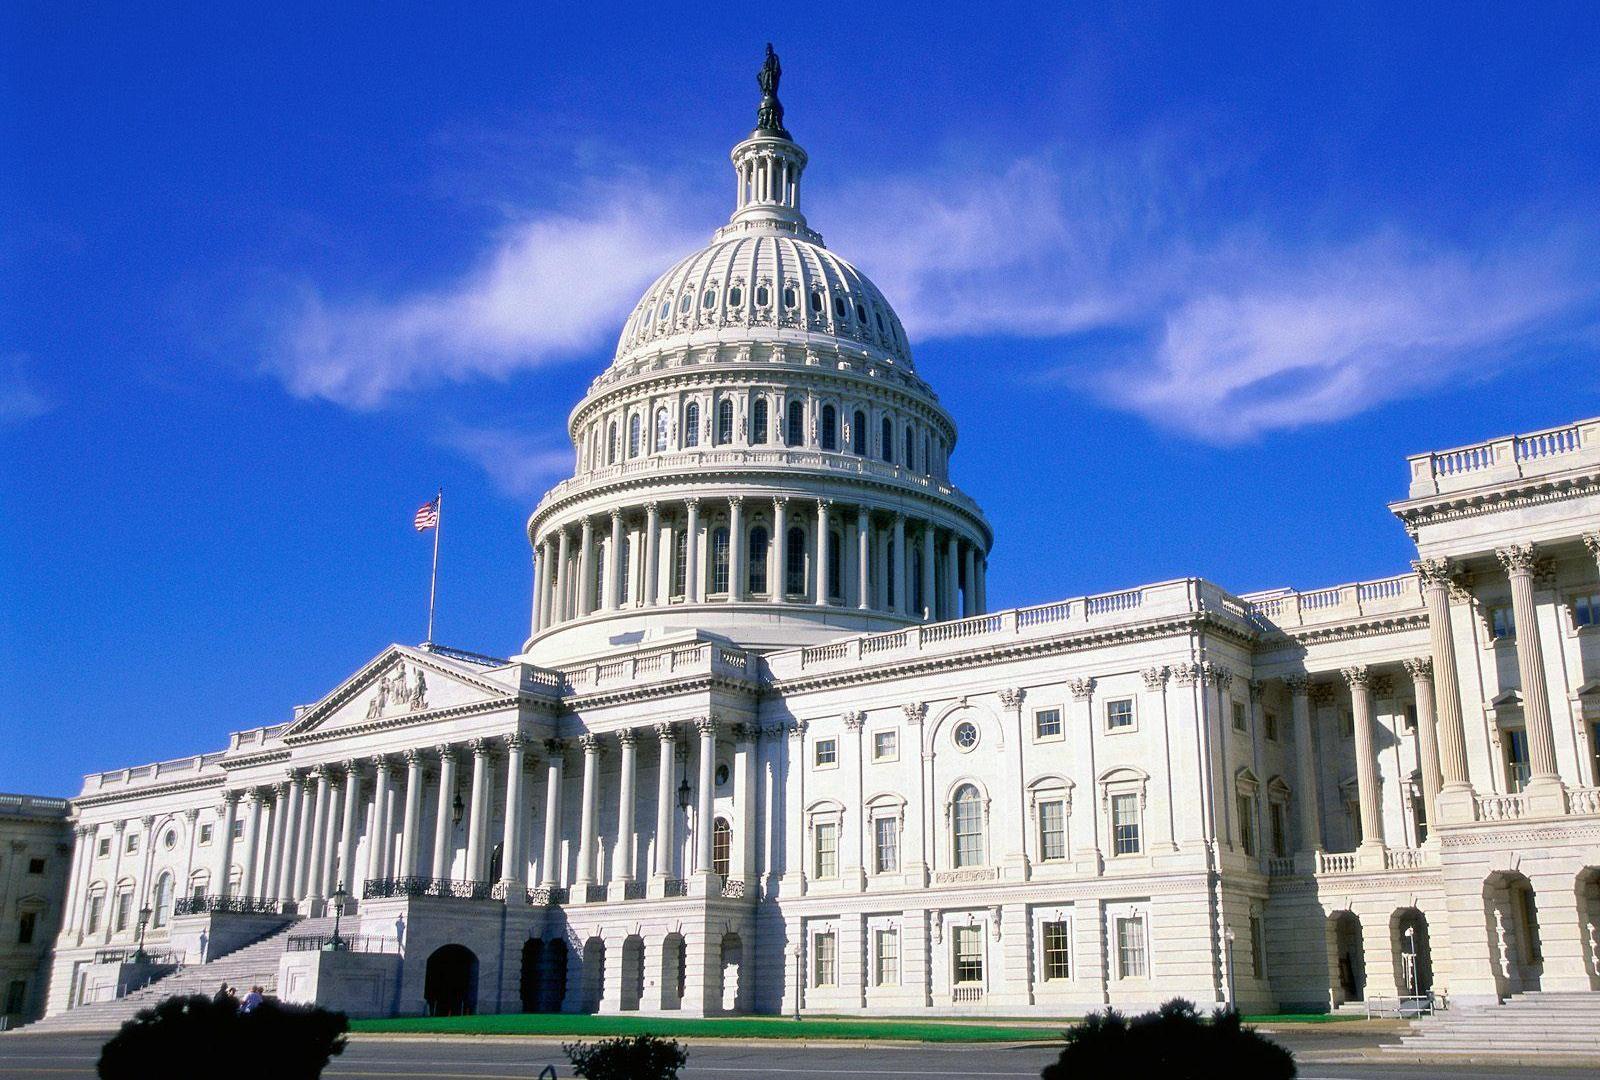 capitol-building-washington-dc-1139704